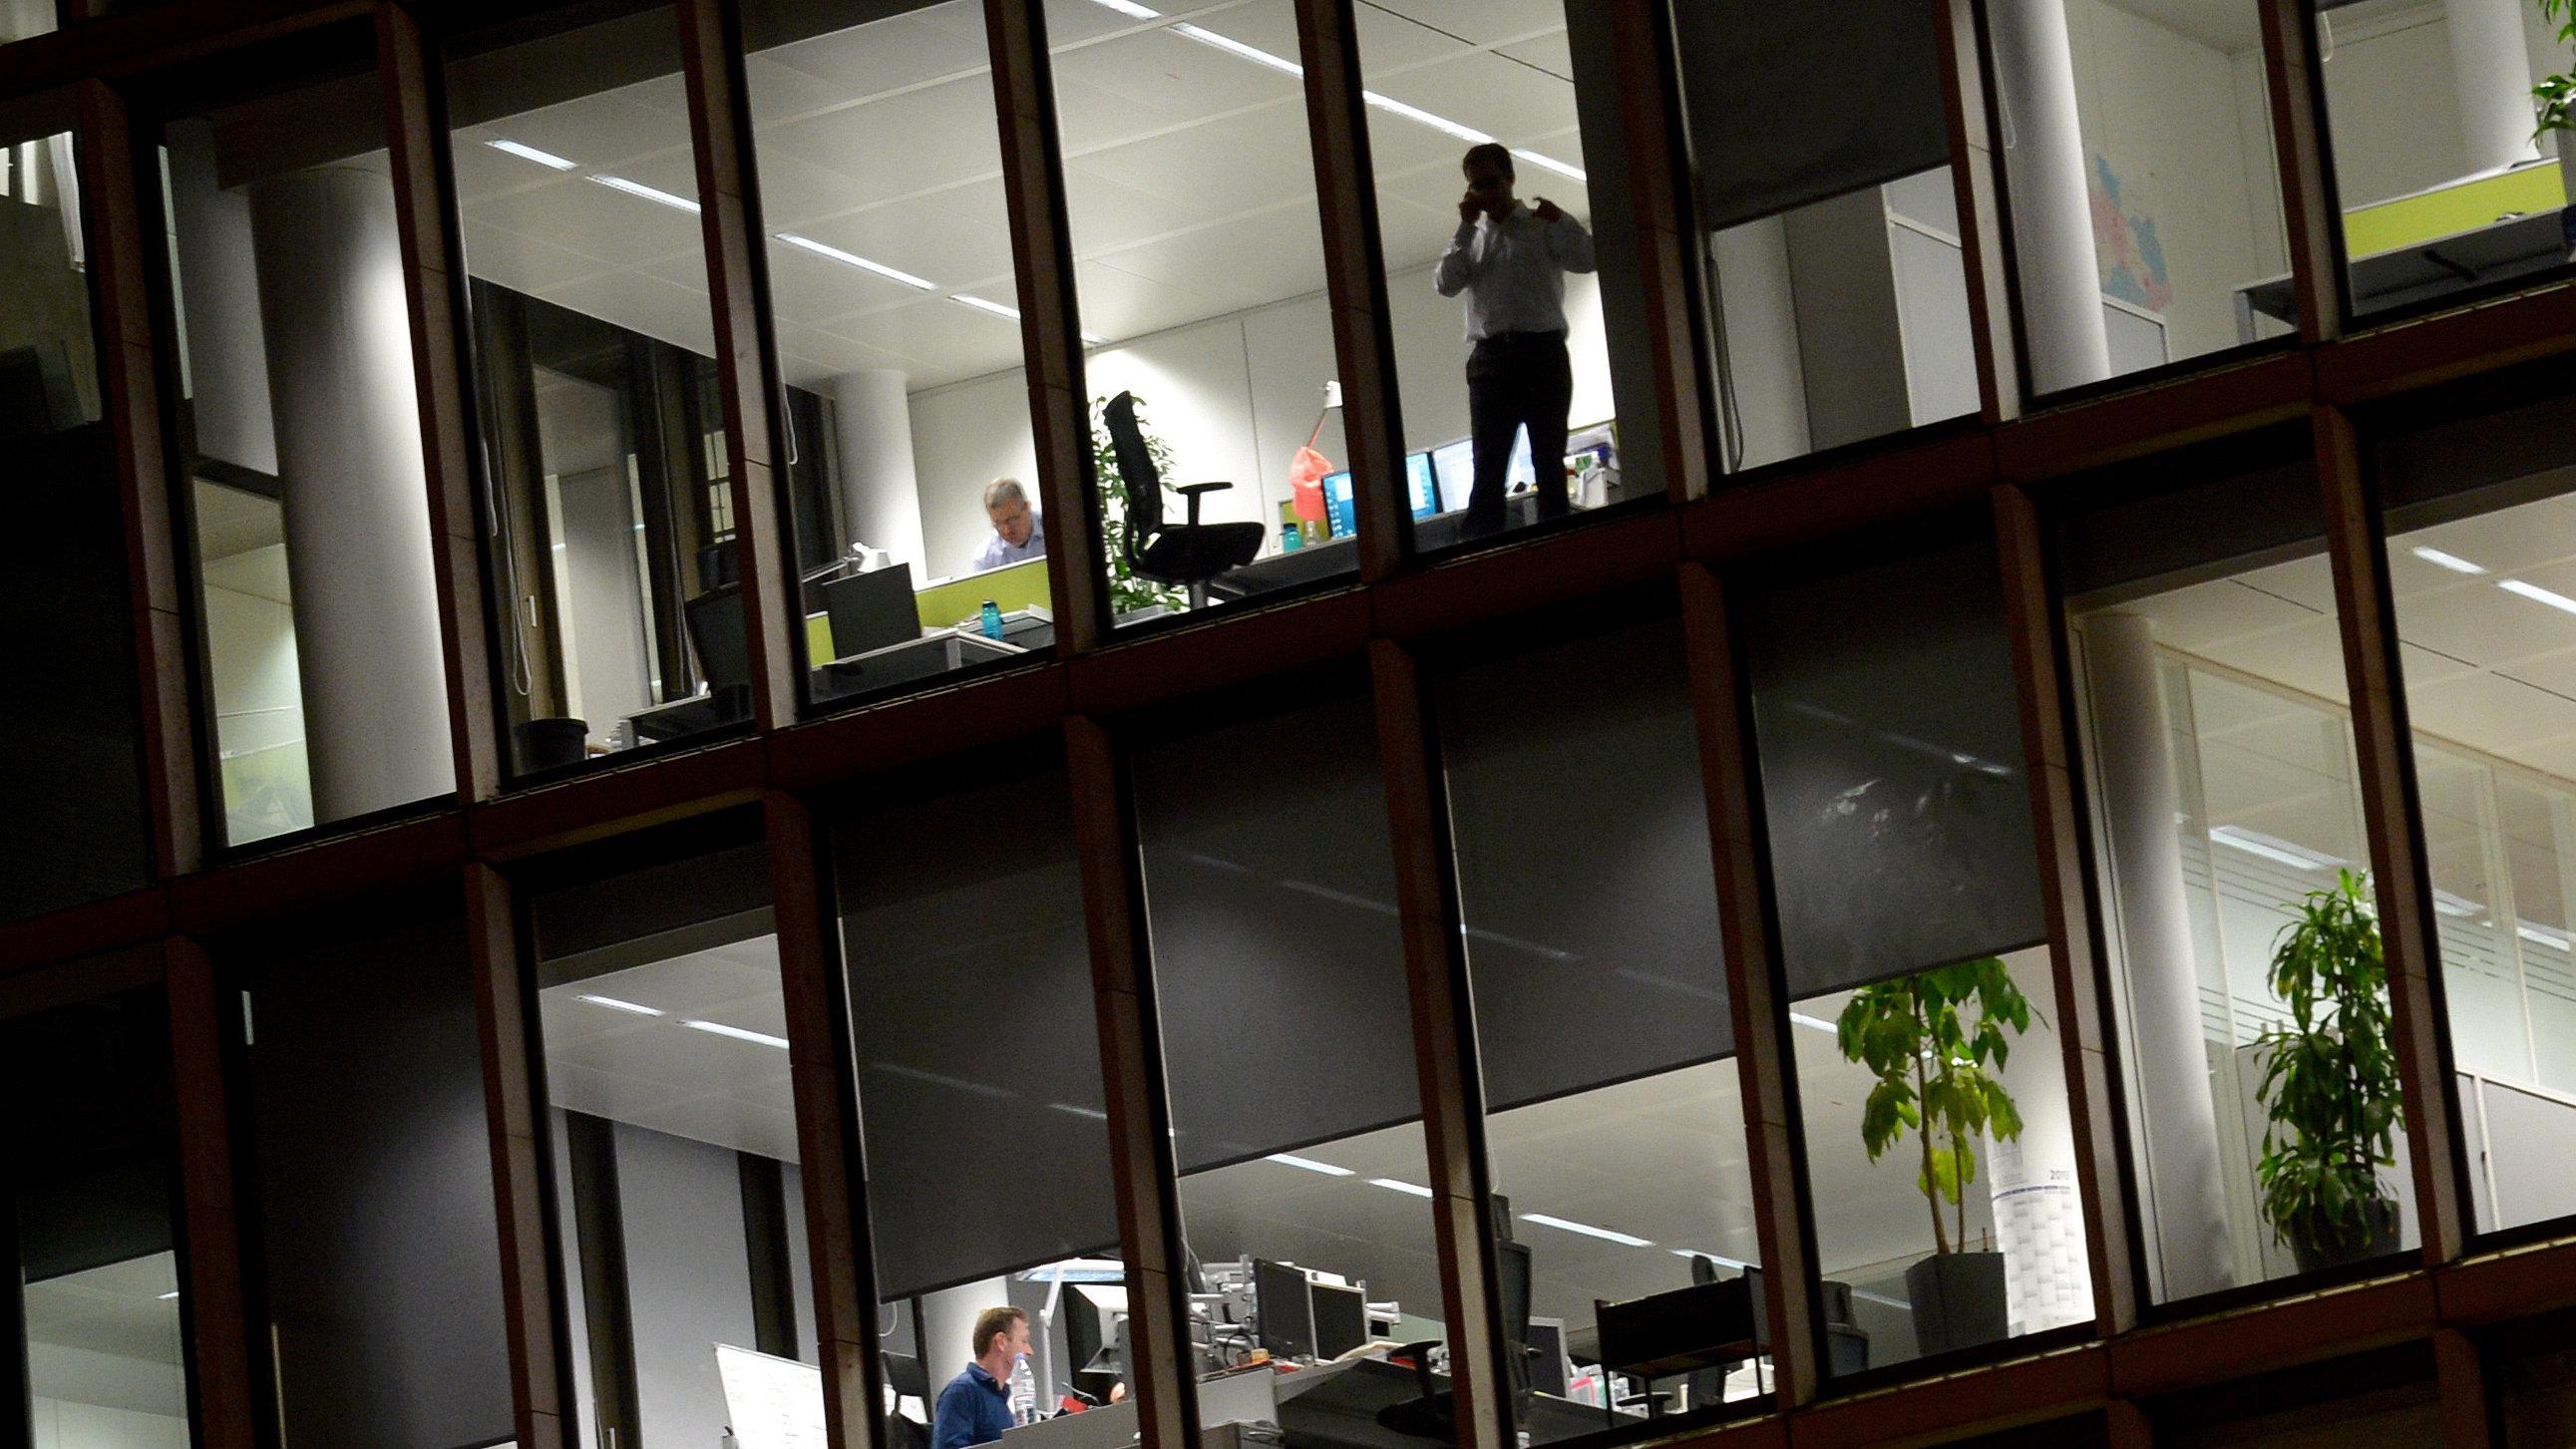 Büroarbeit am späten Abend (Symbolbild)